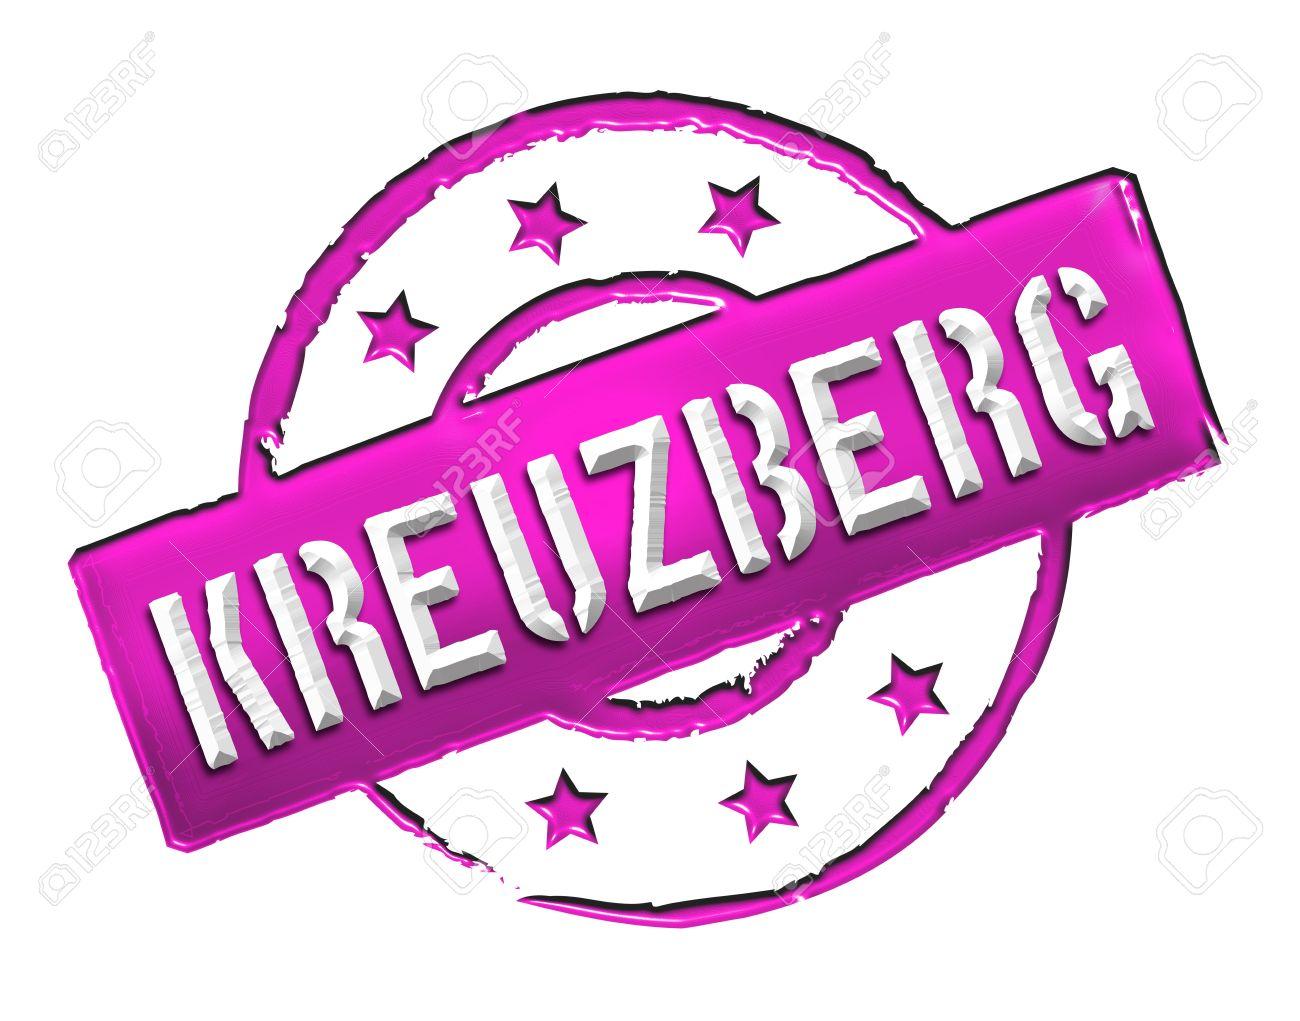 KREUZBERG.